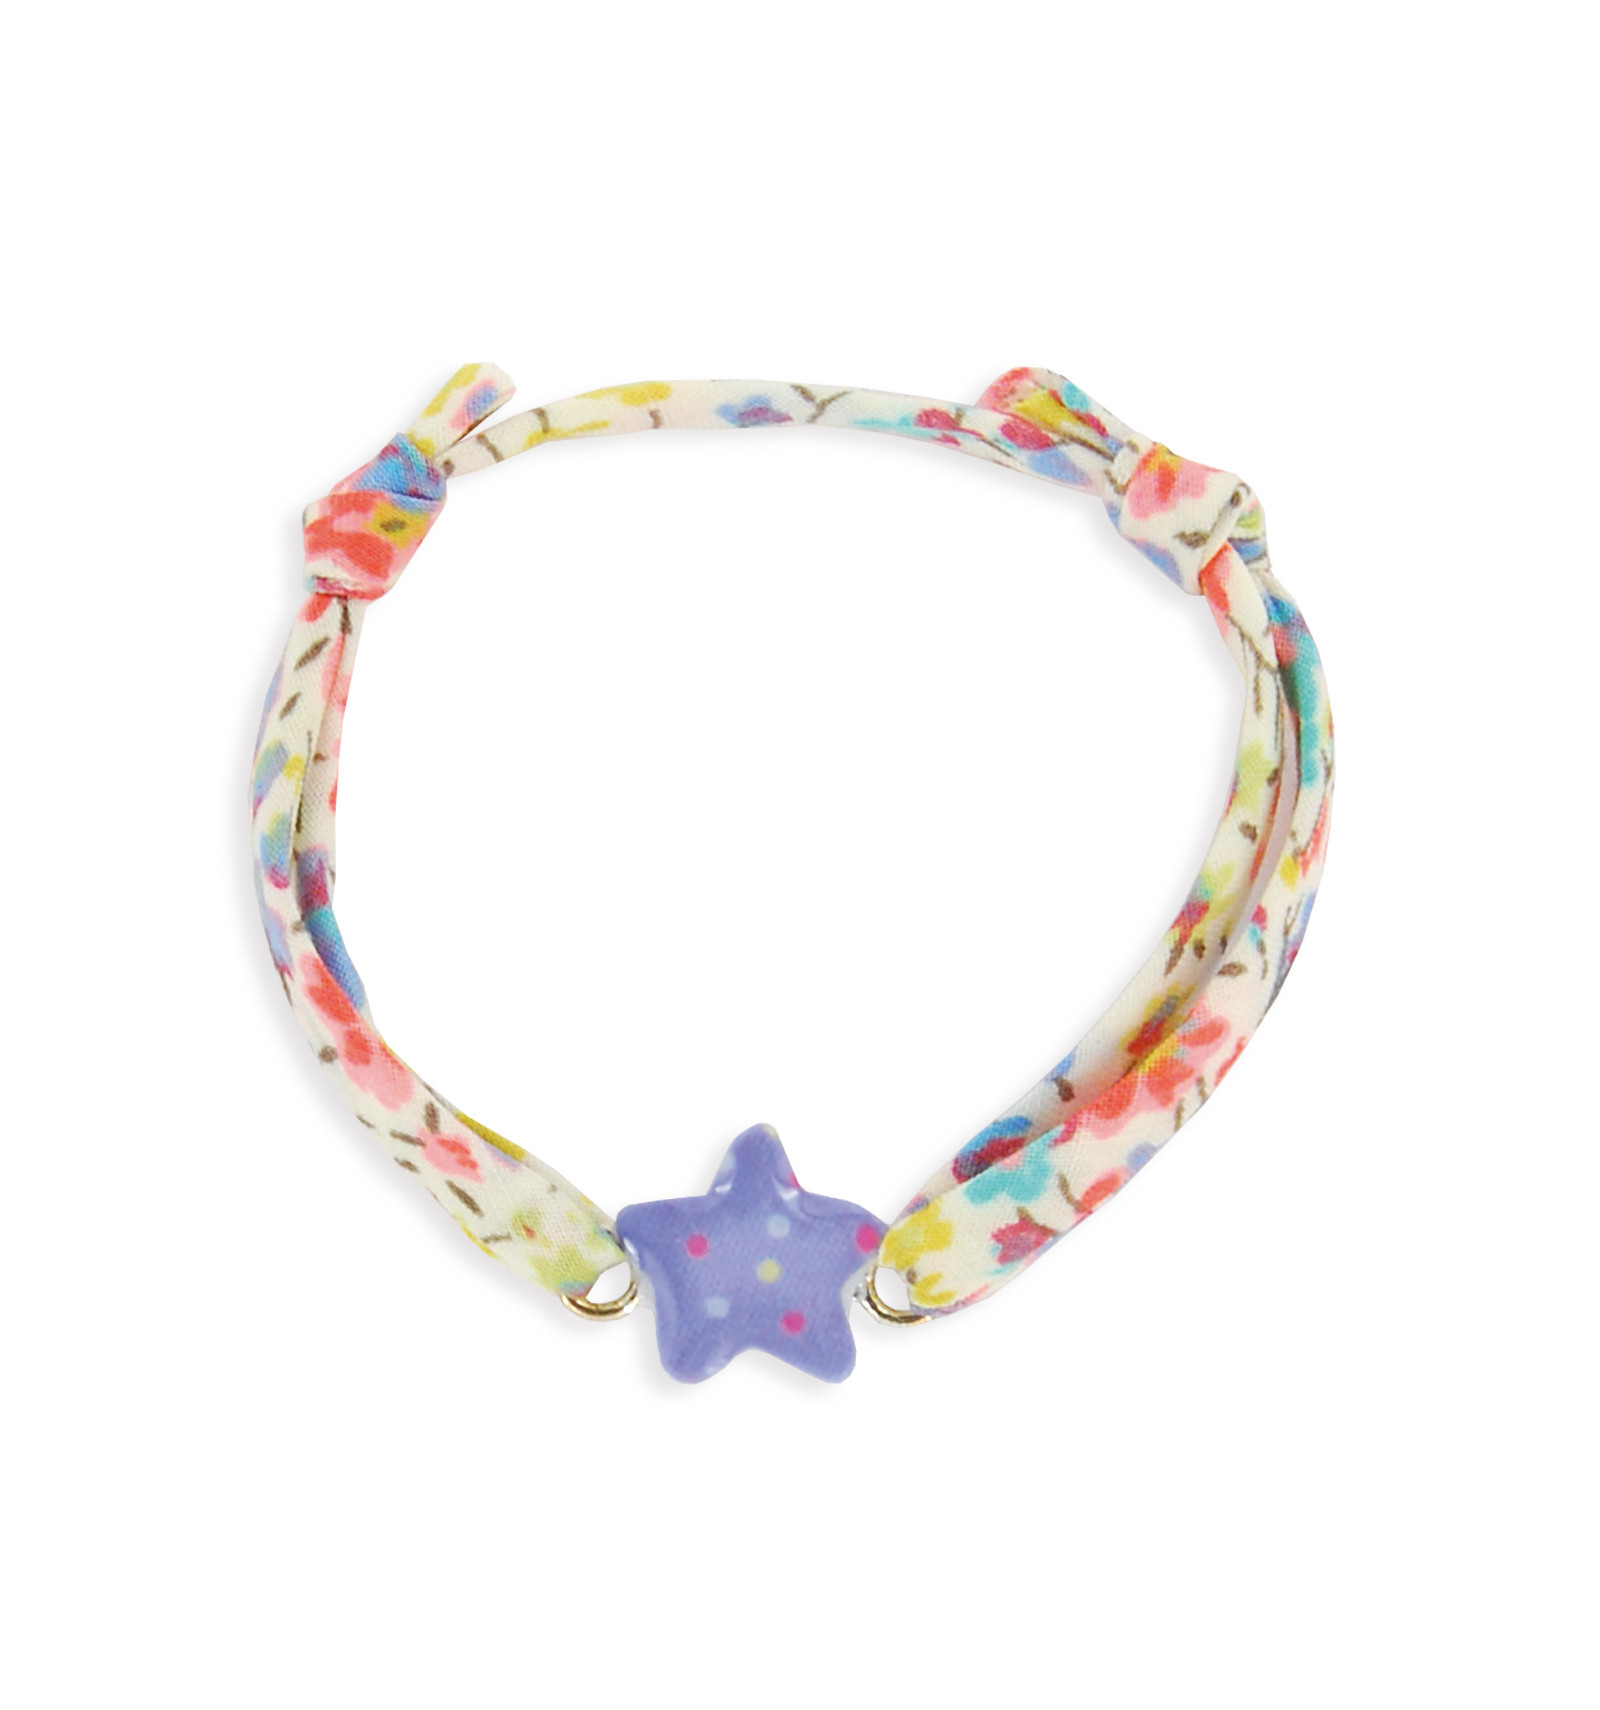 ccdac89da76a55 bracelet enfant étoile ruban ribambelle,idée cadeau baptême,boulogne ...